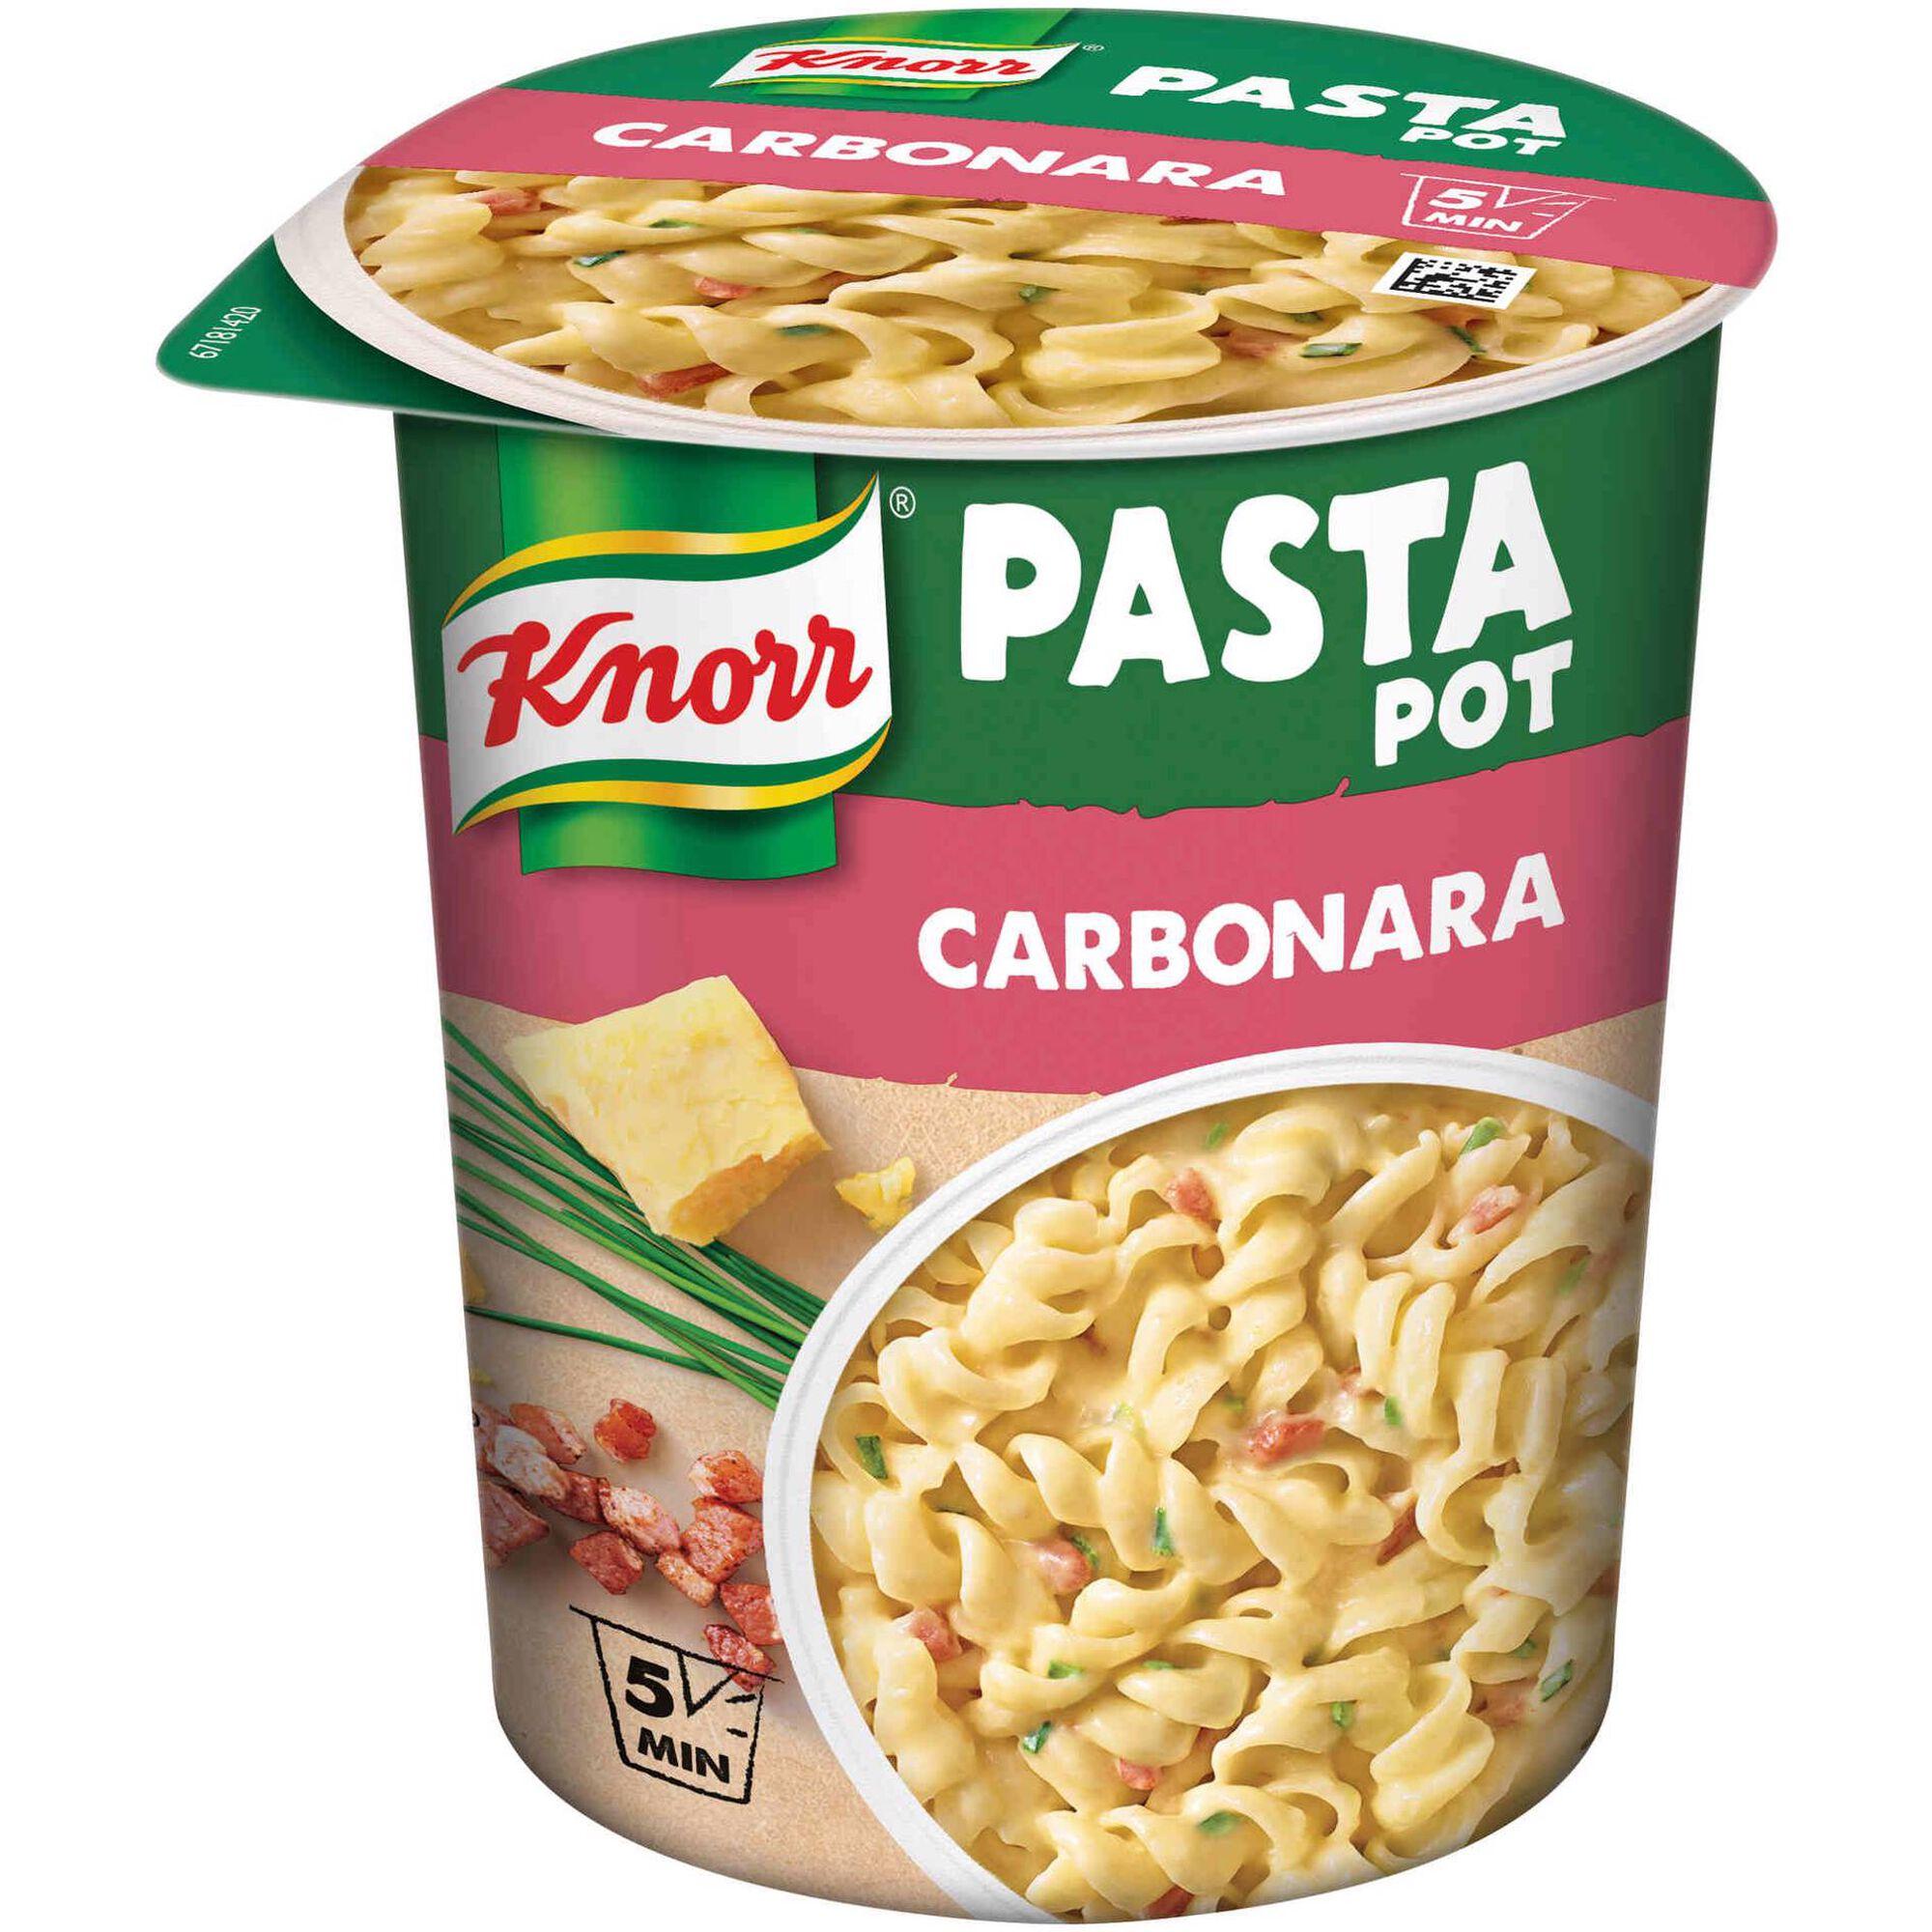 Pasta Carbonara Pot